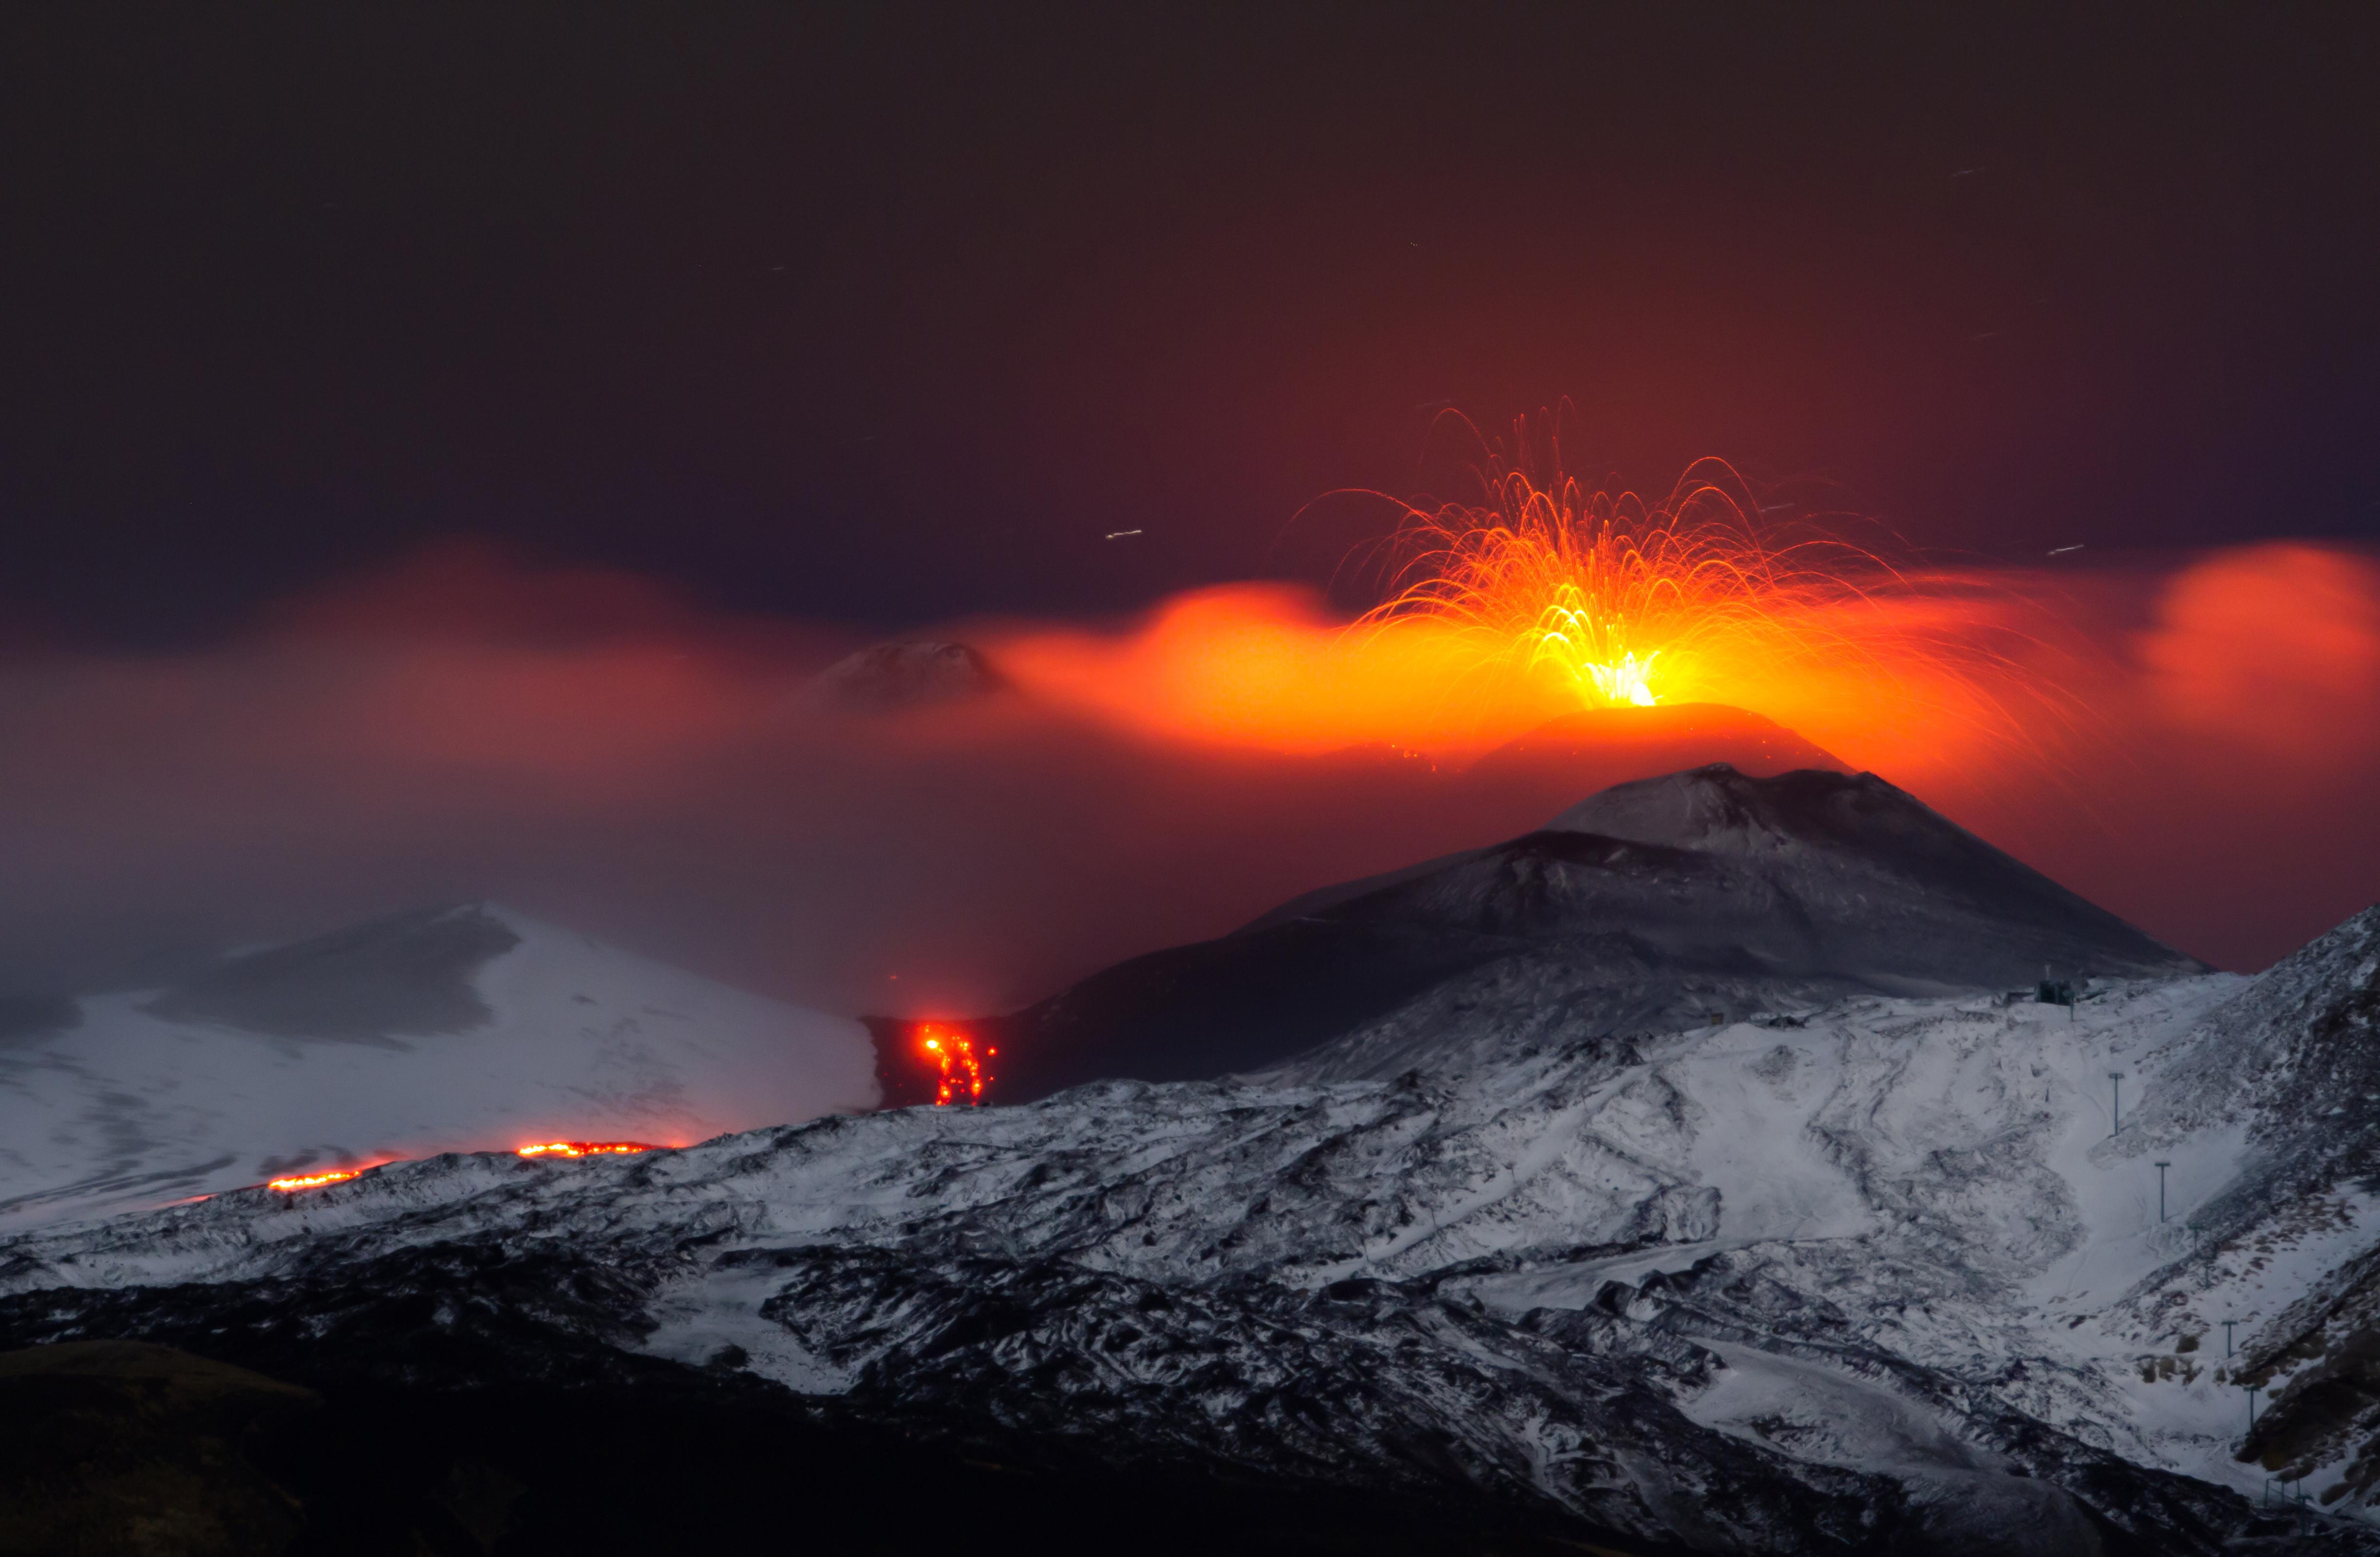 Etna vulkaan uitbarsting